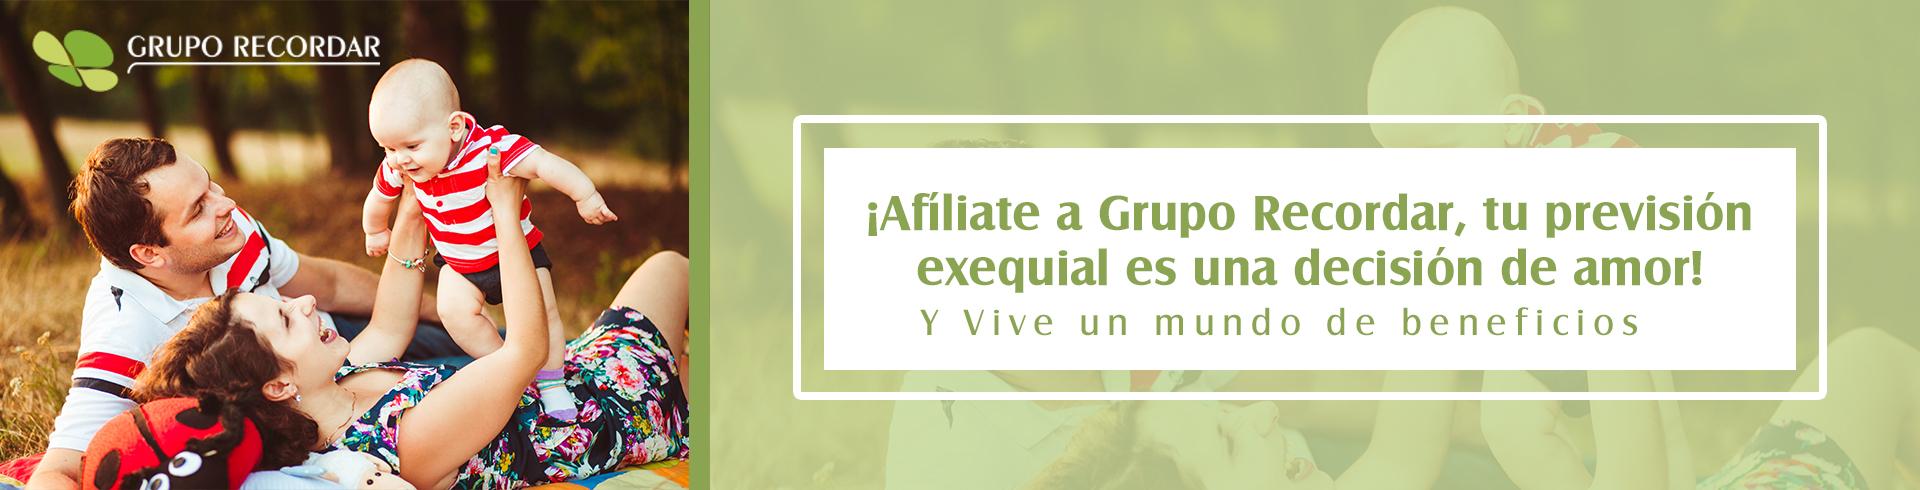 Grupo Recordar